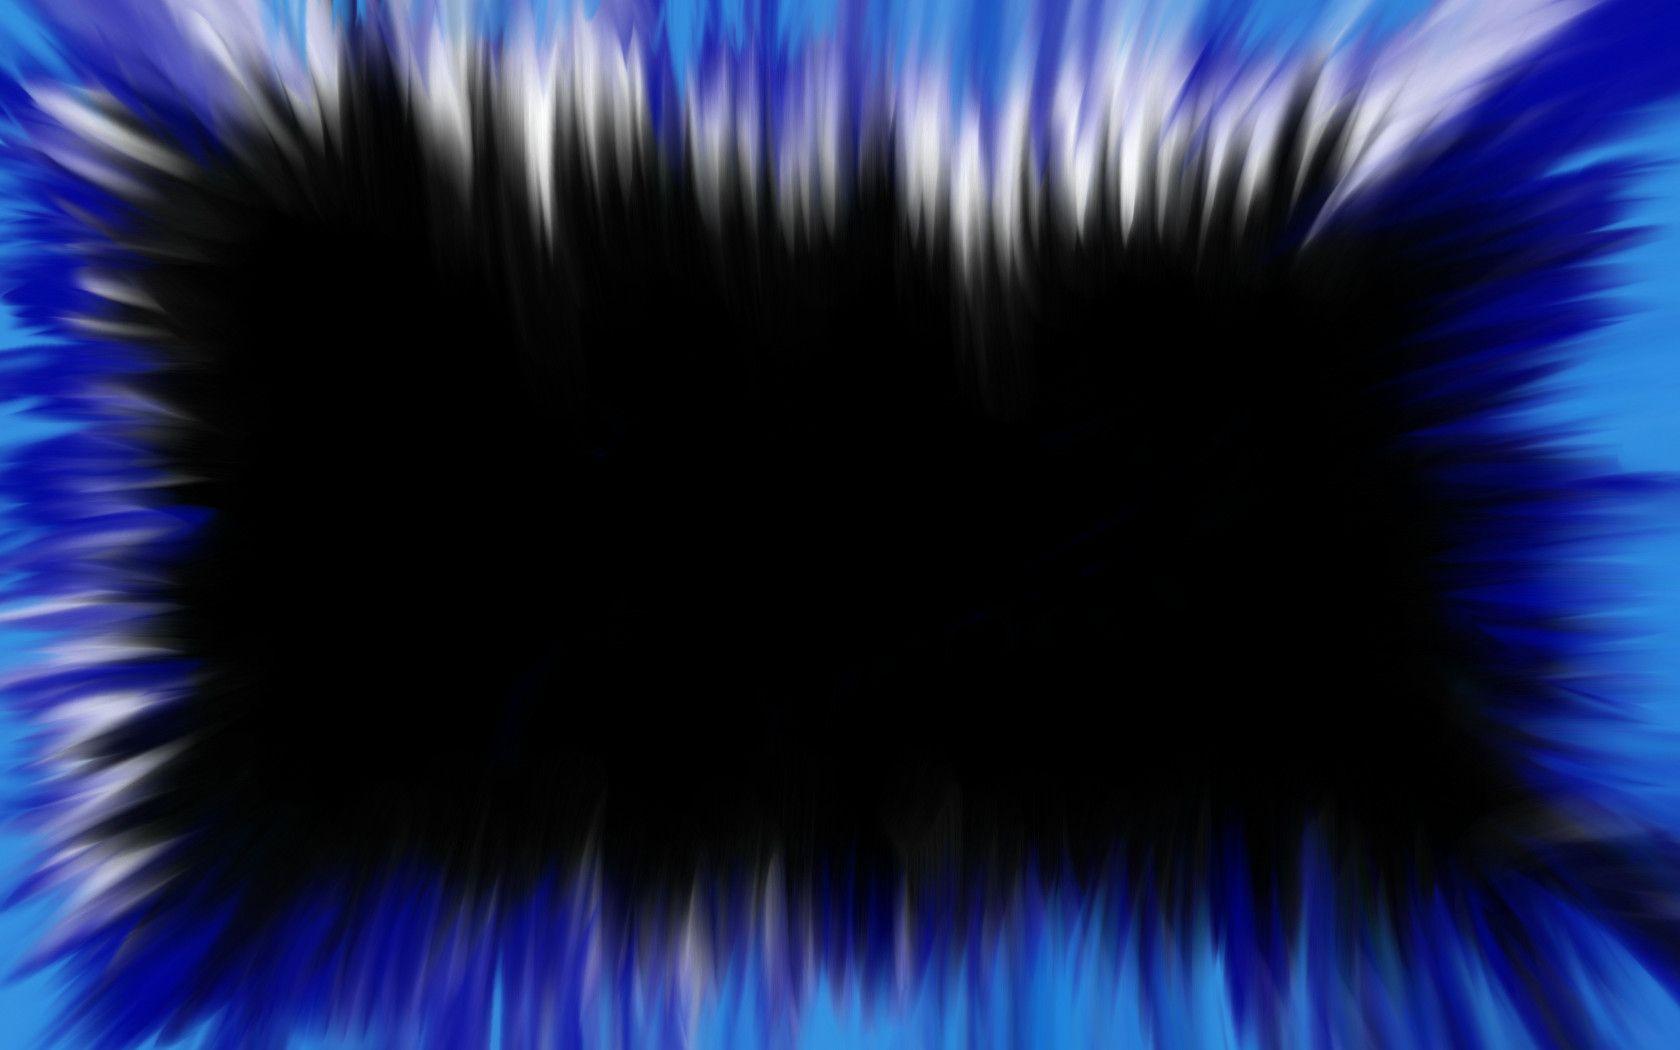 Blue Flame Tiger Wallpaper 1680x1050